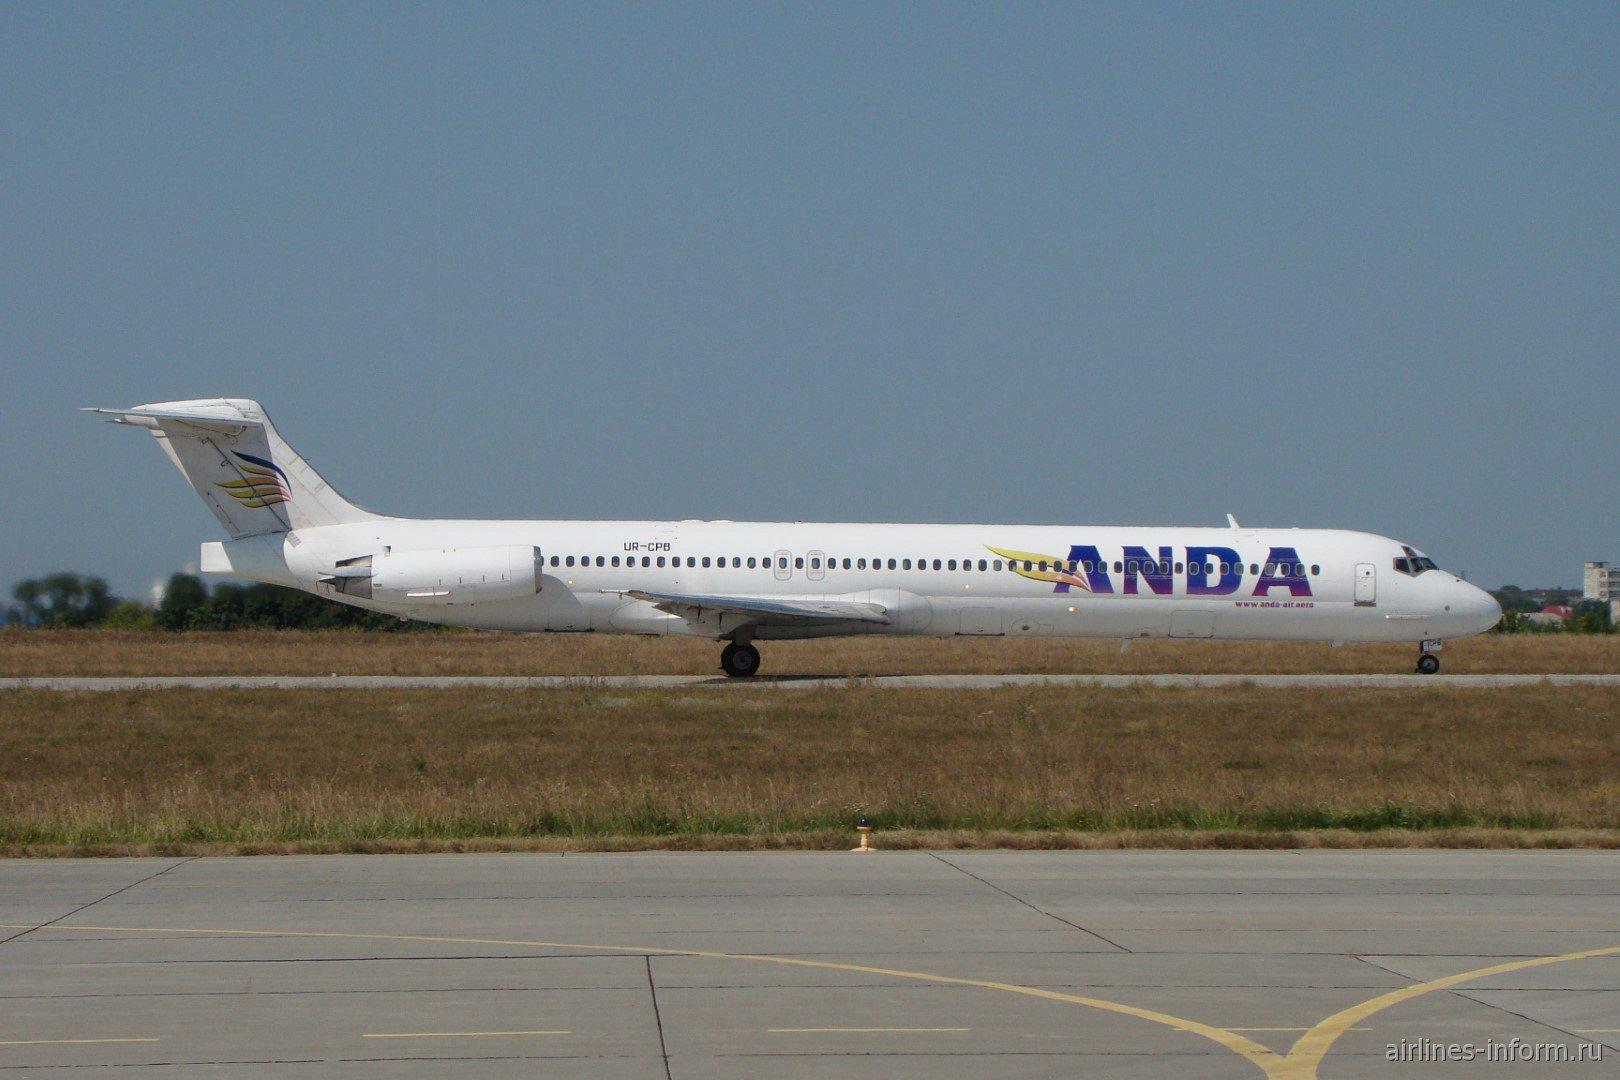 Авиалайнер MD-83 UR-CPB авиакомпании Anda Air в аэропорту Харьков